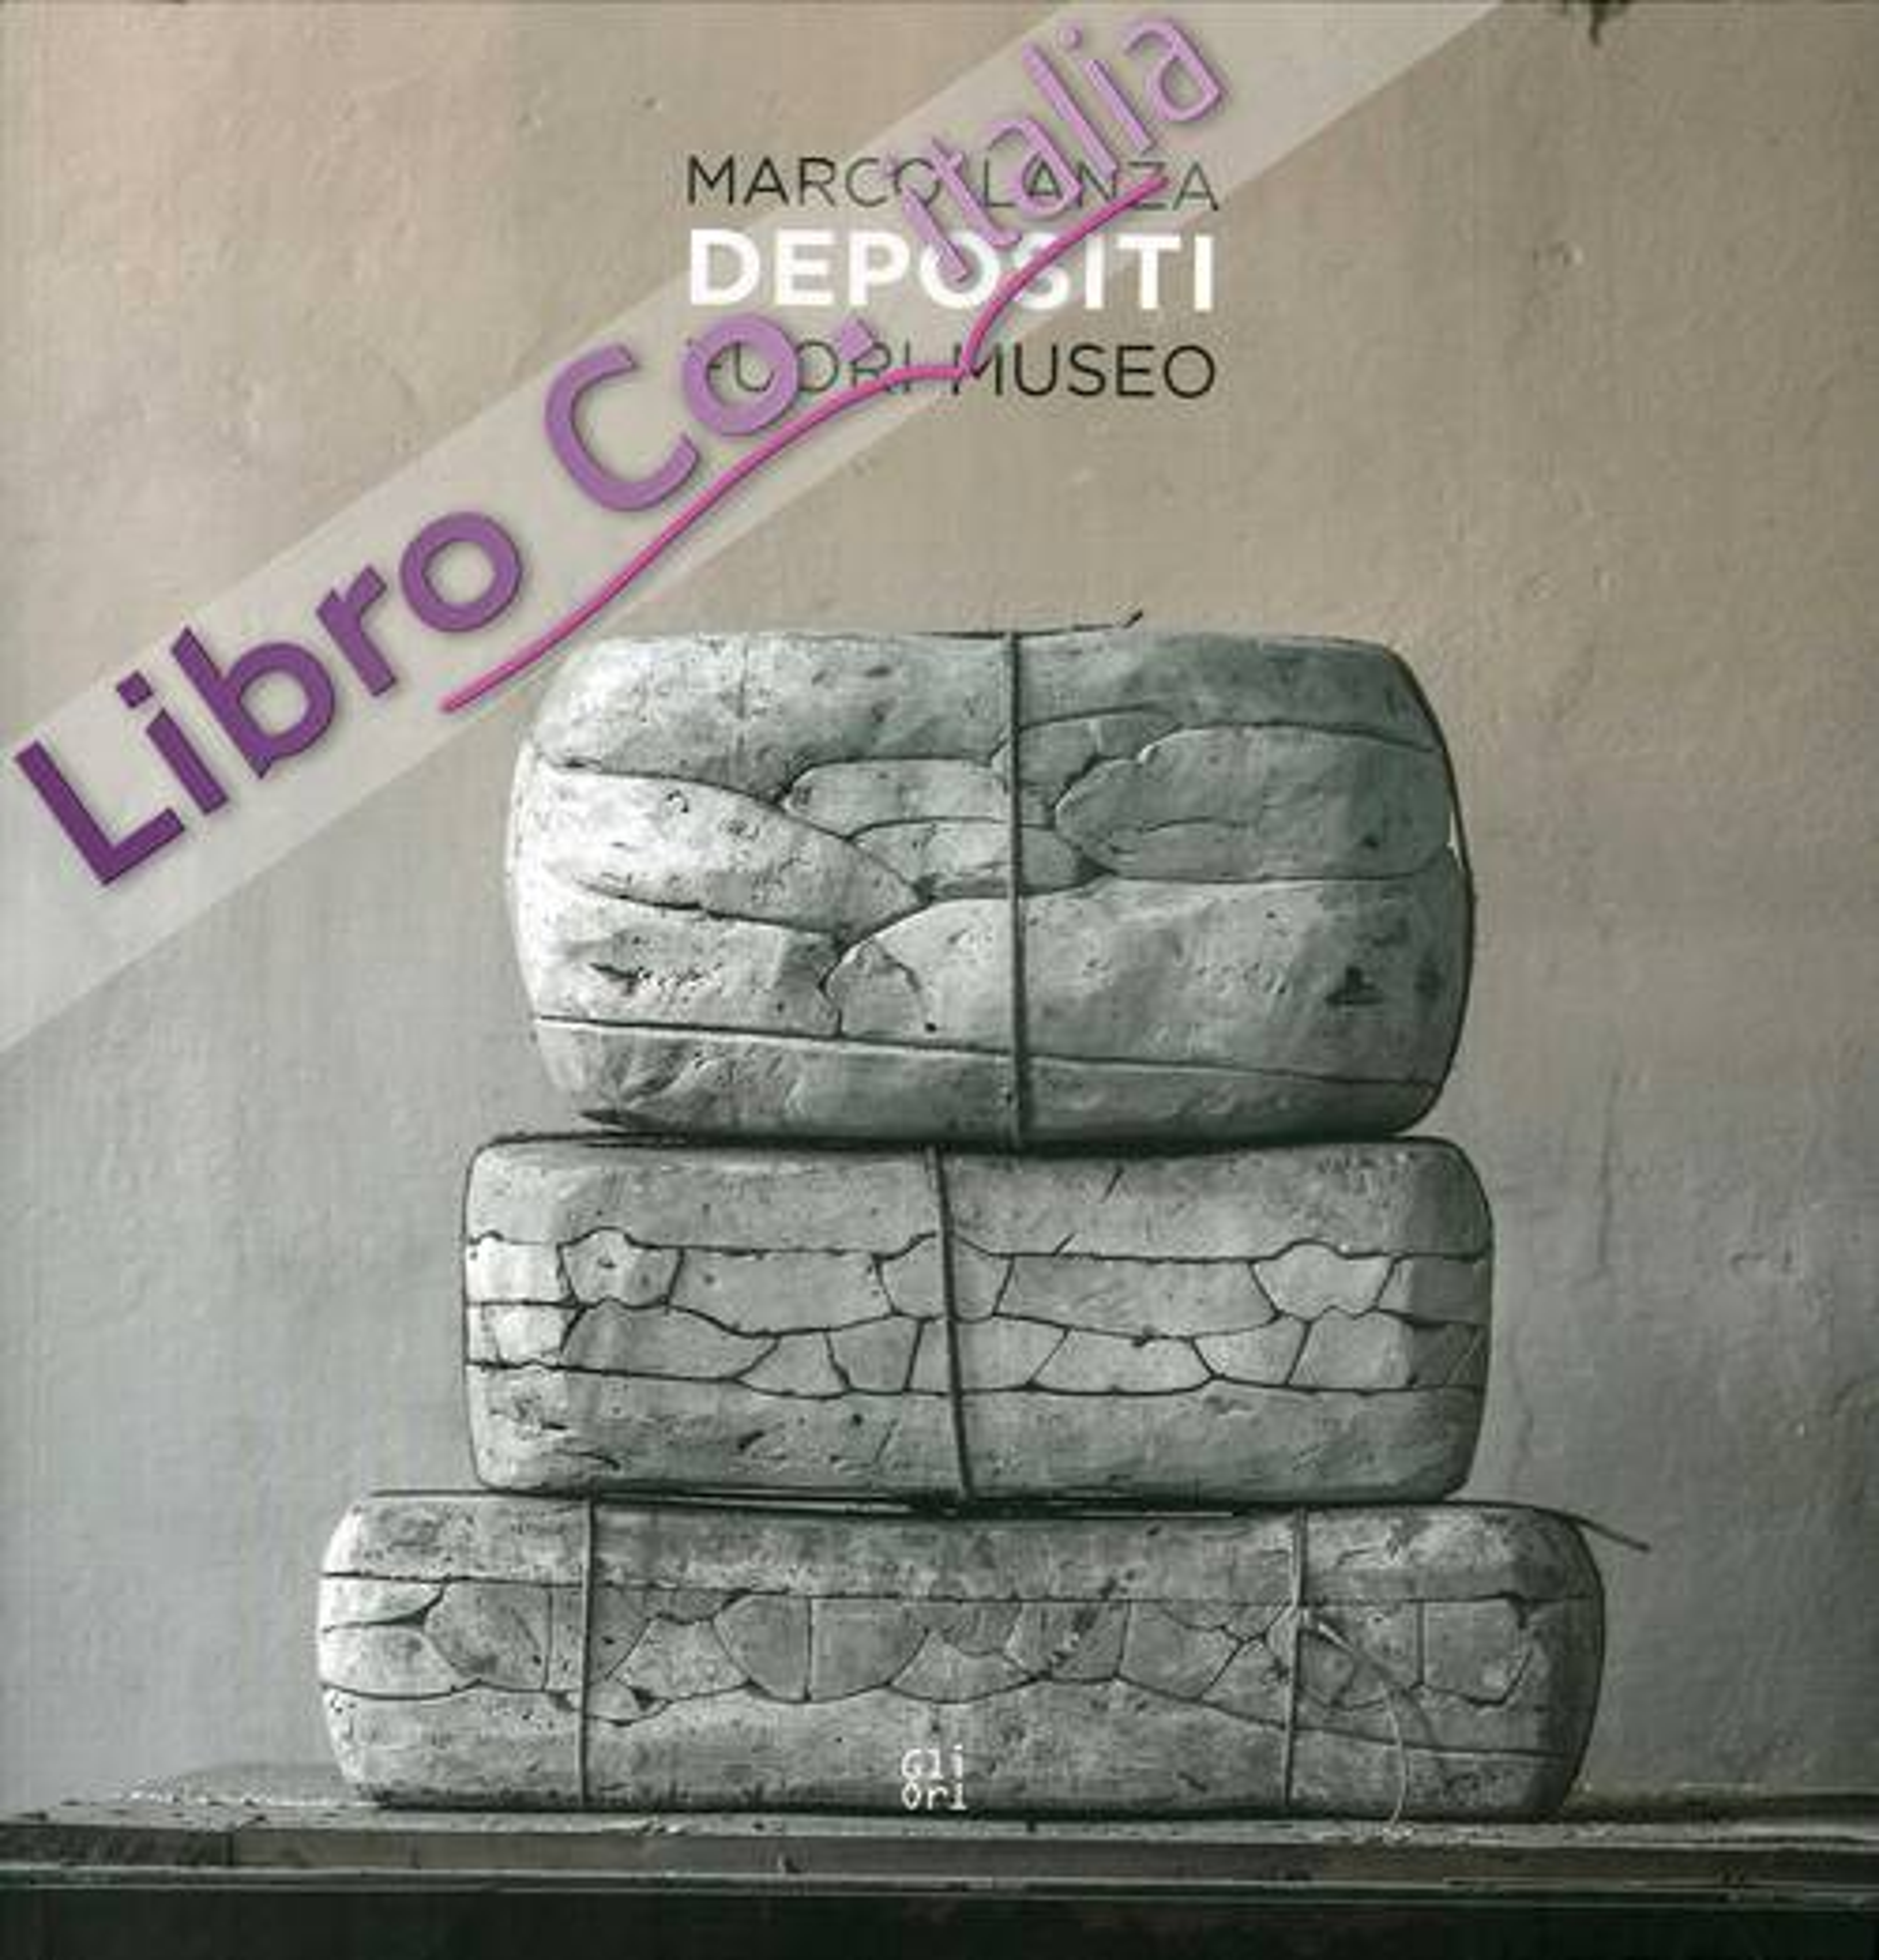 Marco Lanza. Depositi. Fuori museo